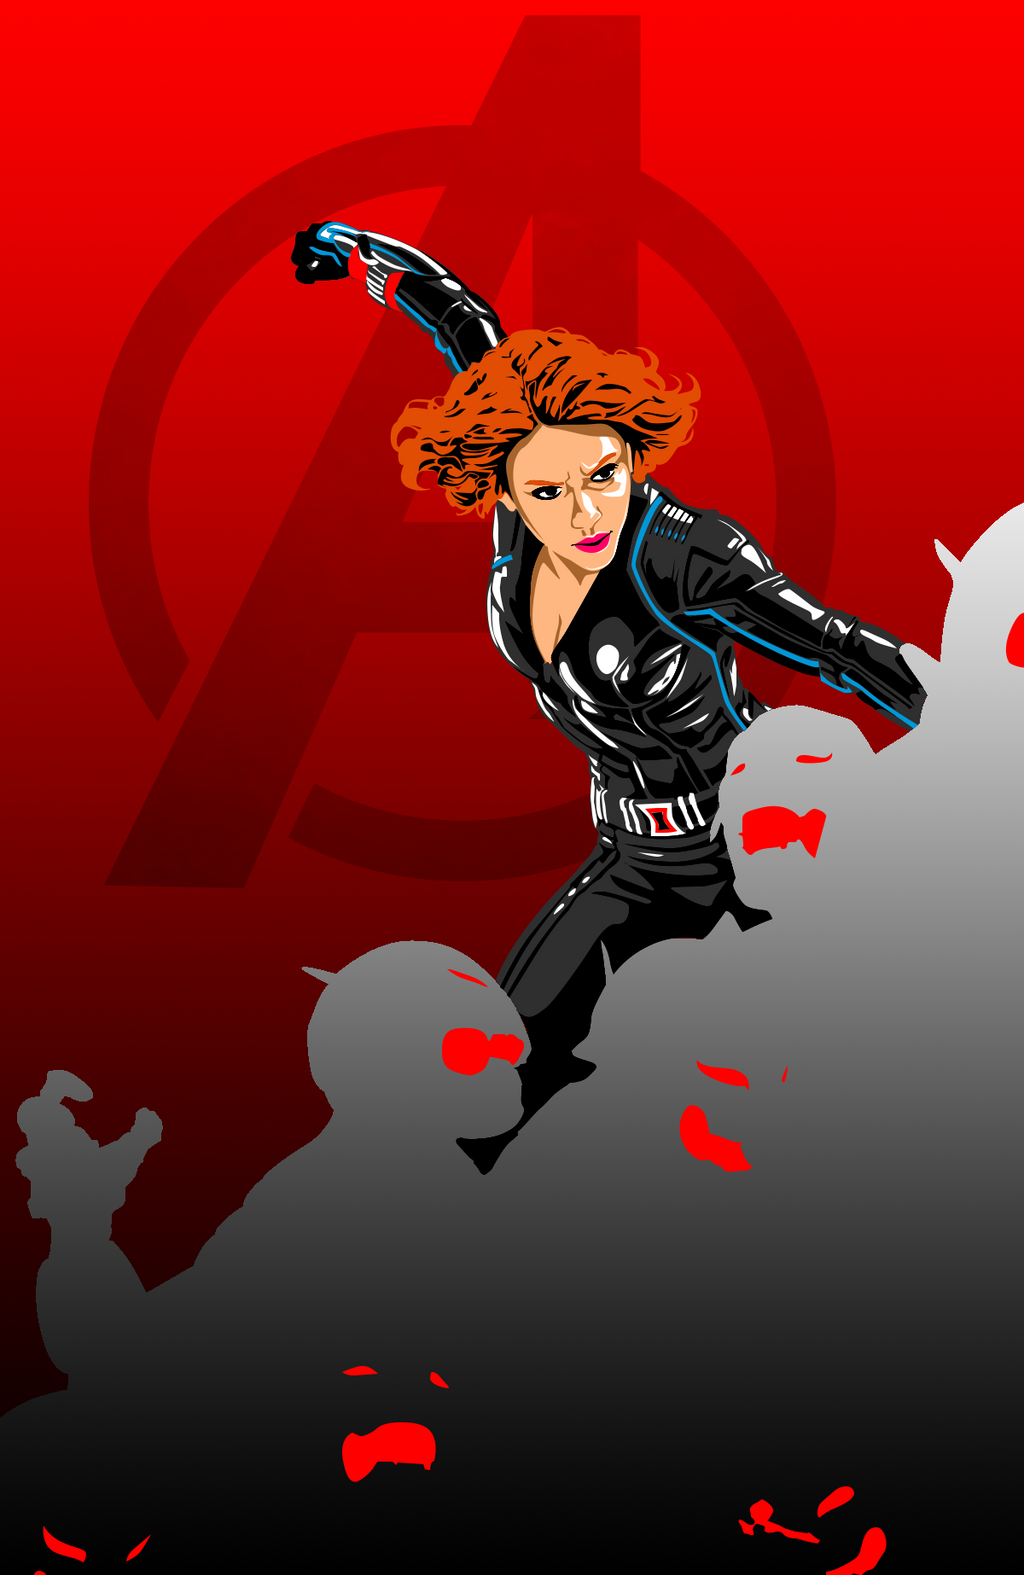 Avengers Age of Ultron Black Widow Age of Ultron Black Widow